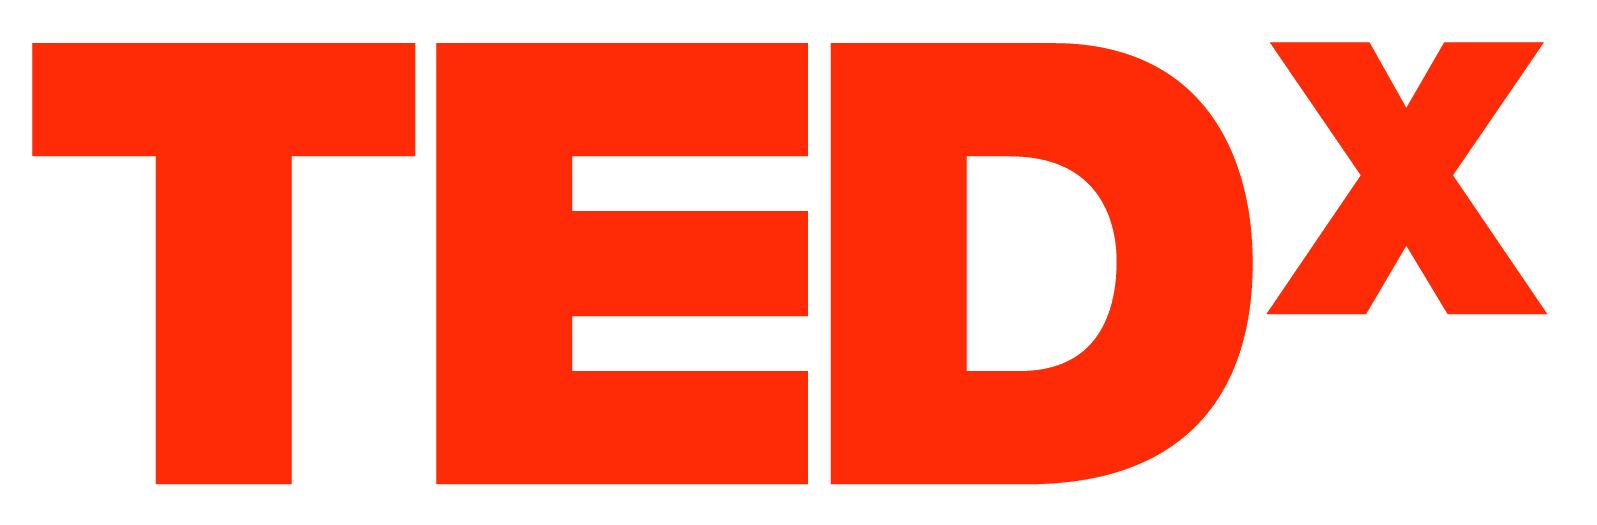 TEDx_transparent.png